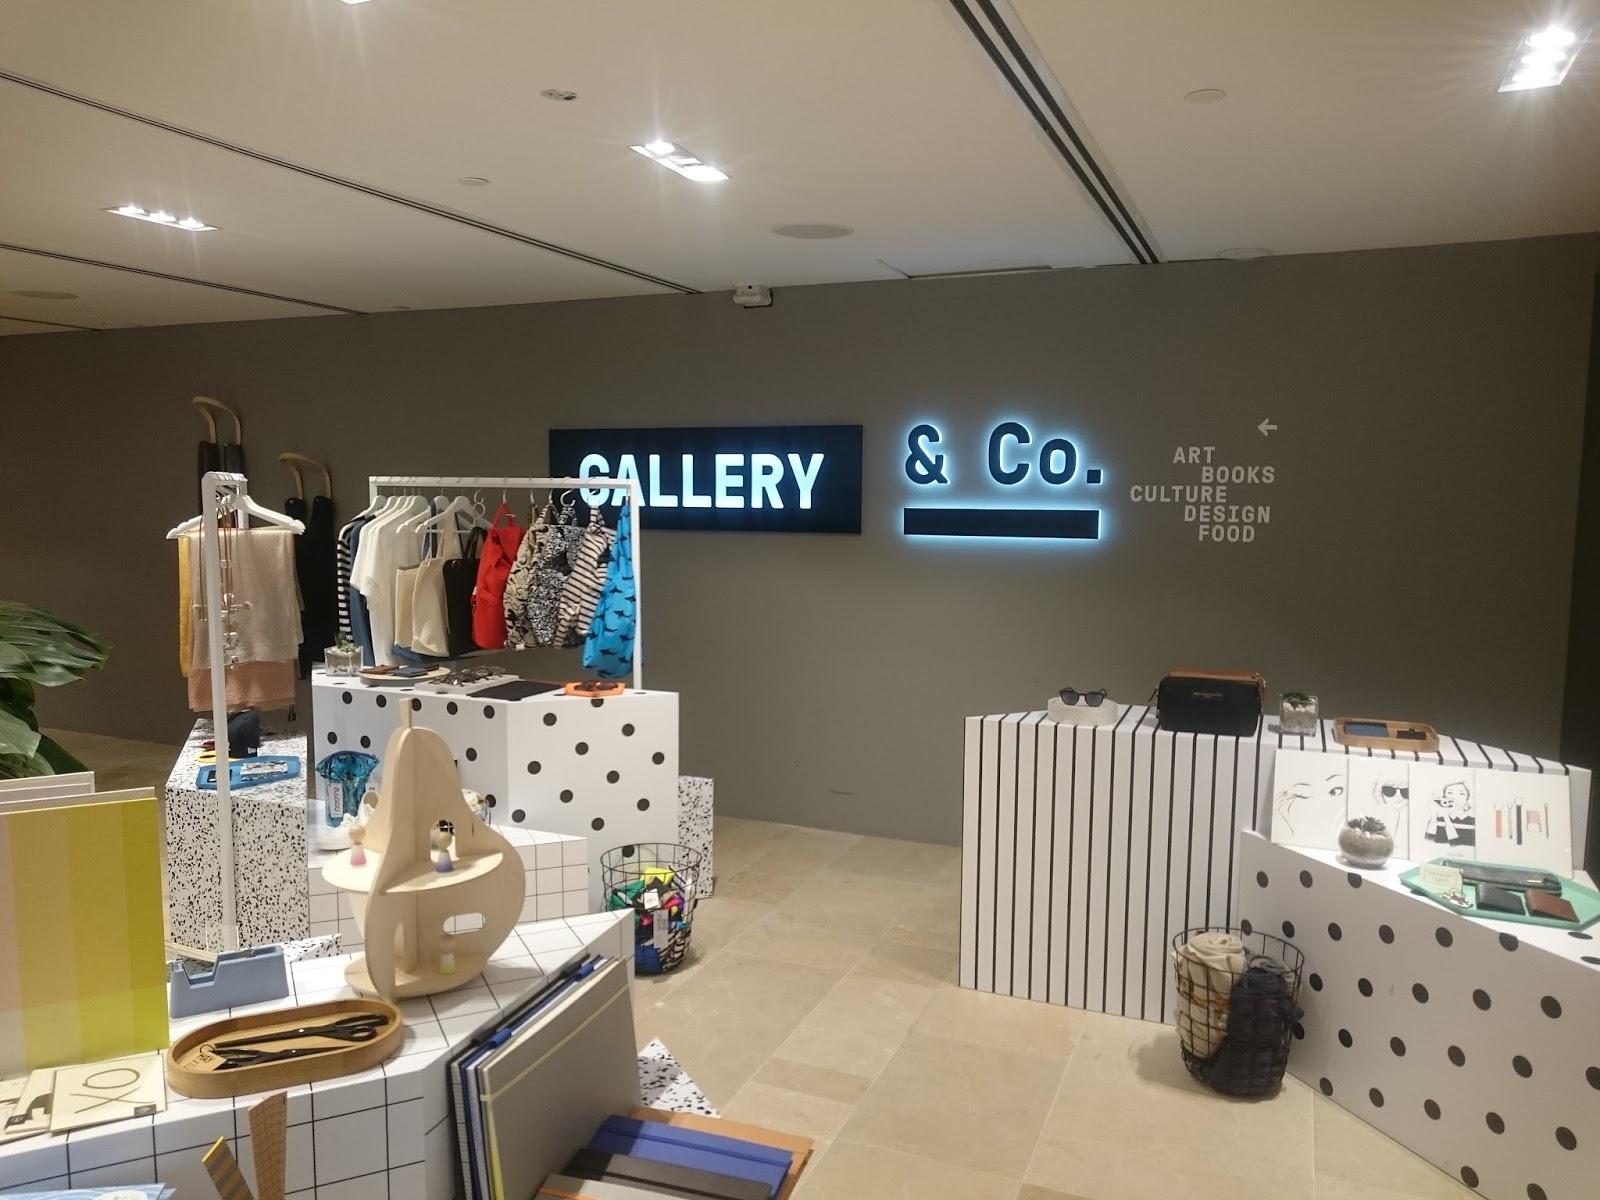 「Gallery & Co. sg」の画像検索結果